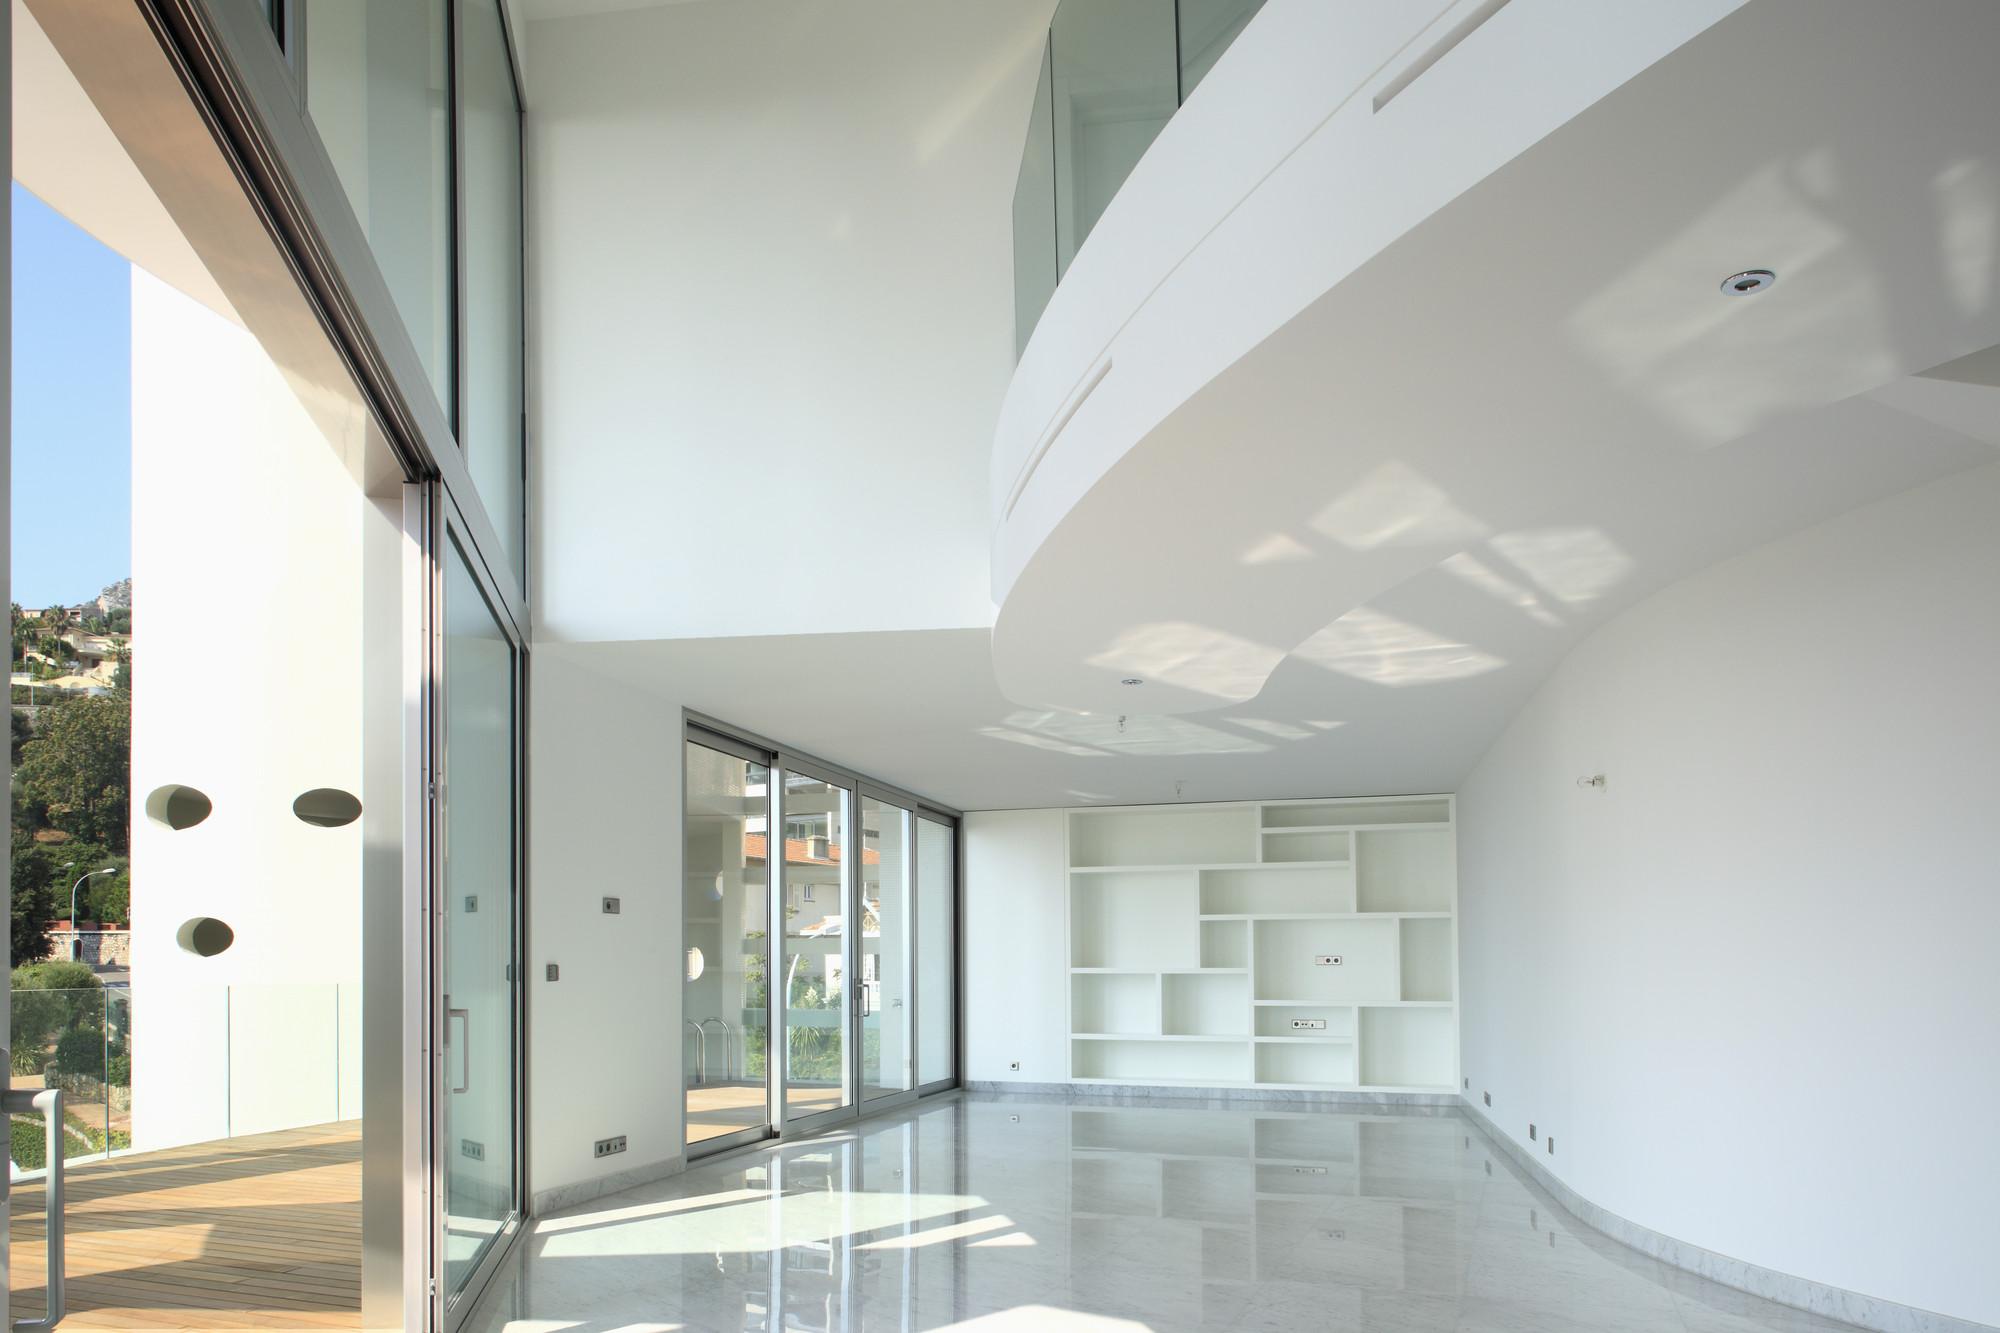 The Simona / Jean-Pierre Lott Architecte